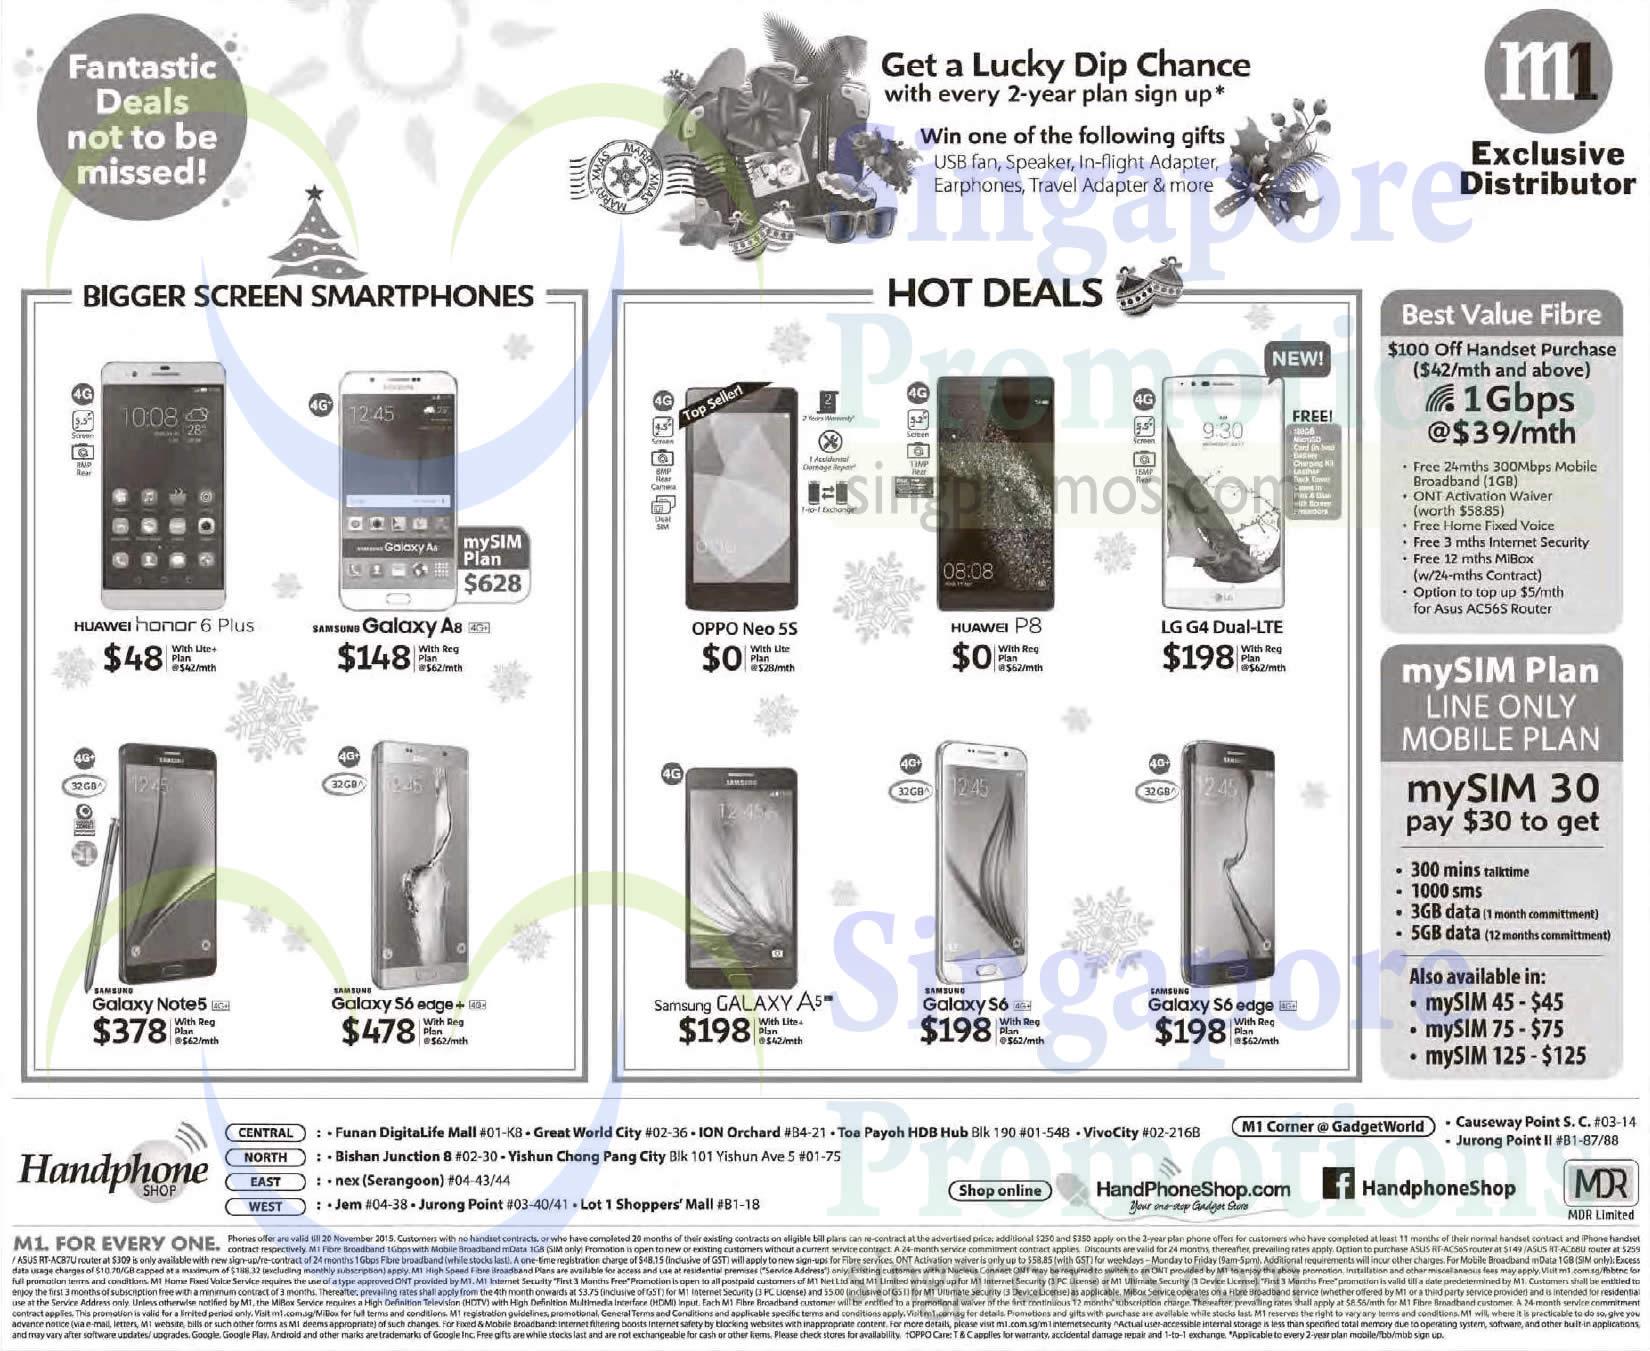 Handphone Shop Huawei Honor 6 Plus P8 Samsung Galaxy A8